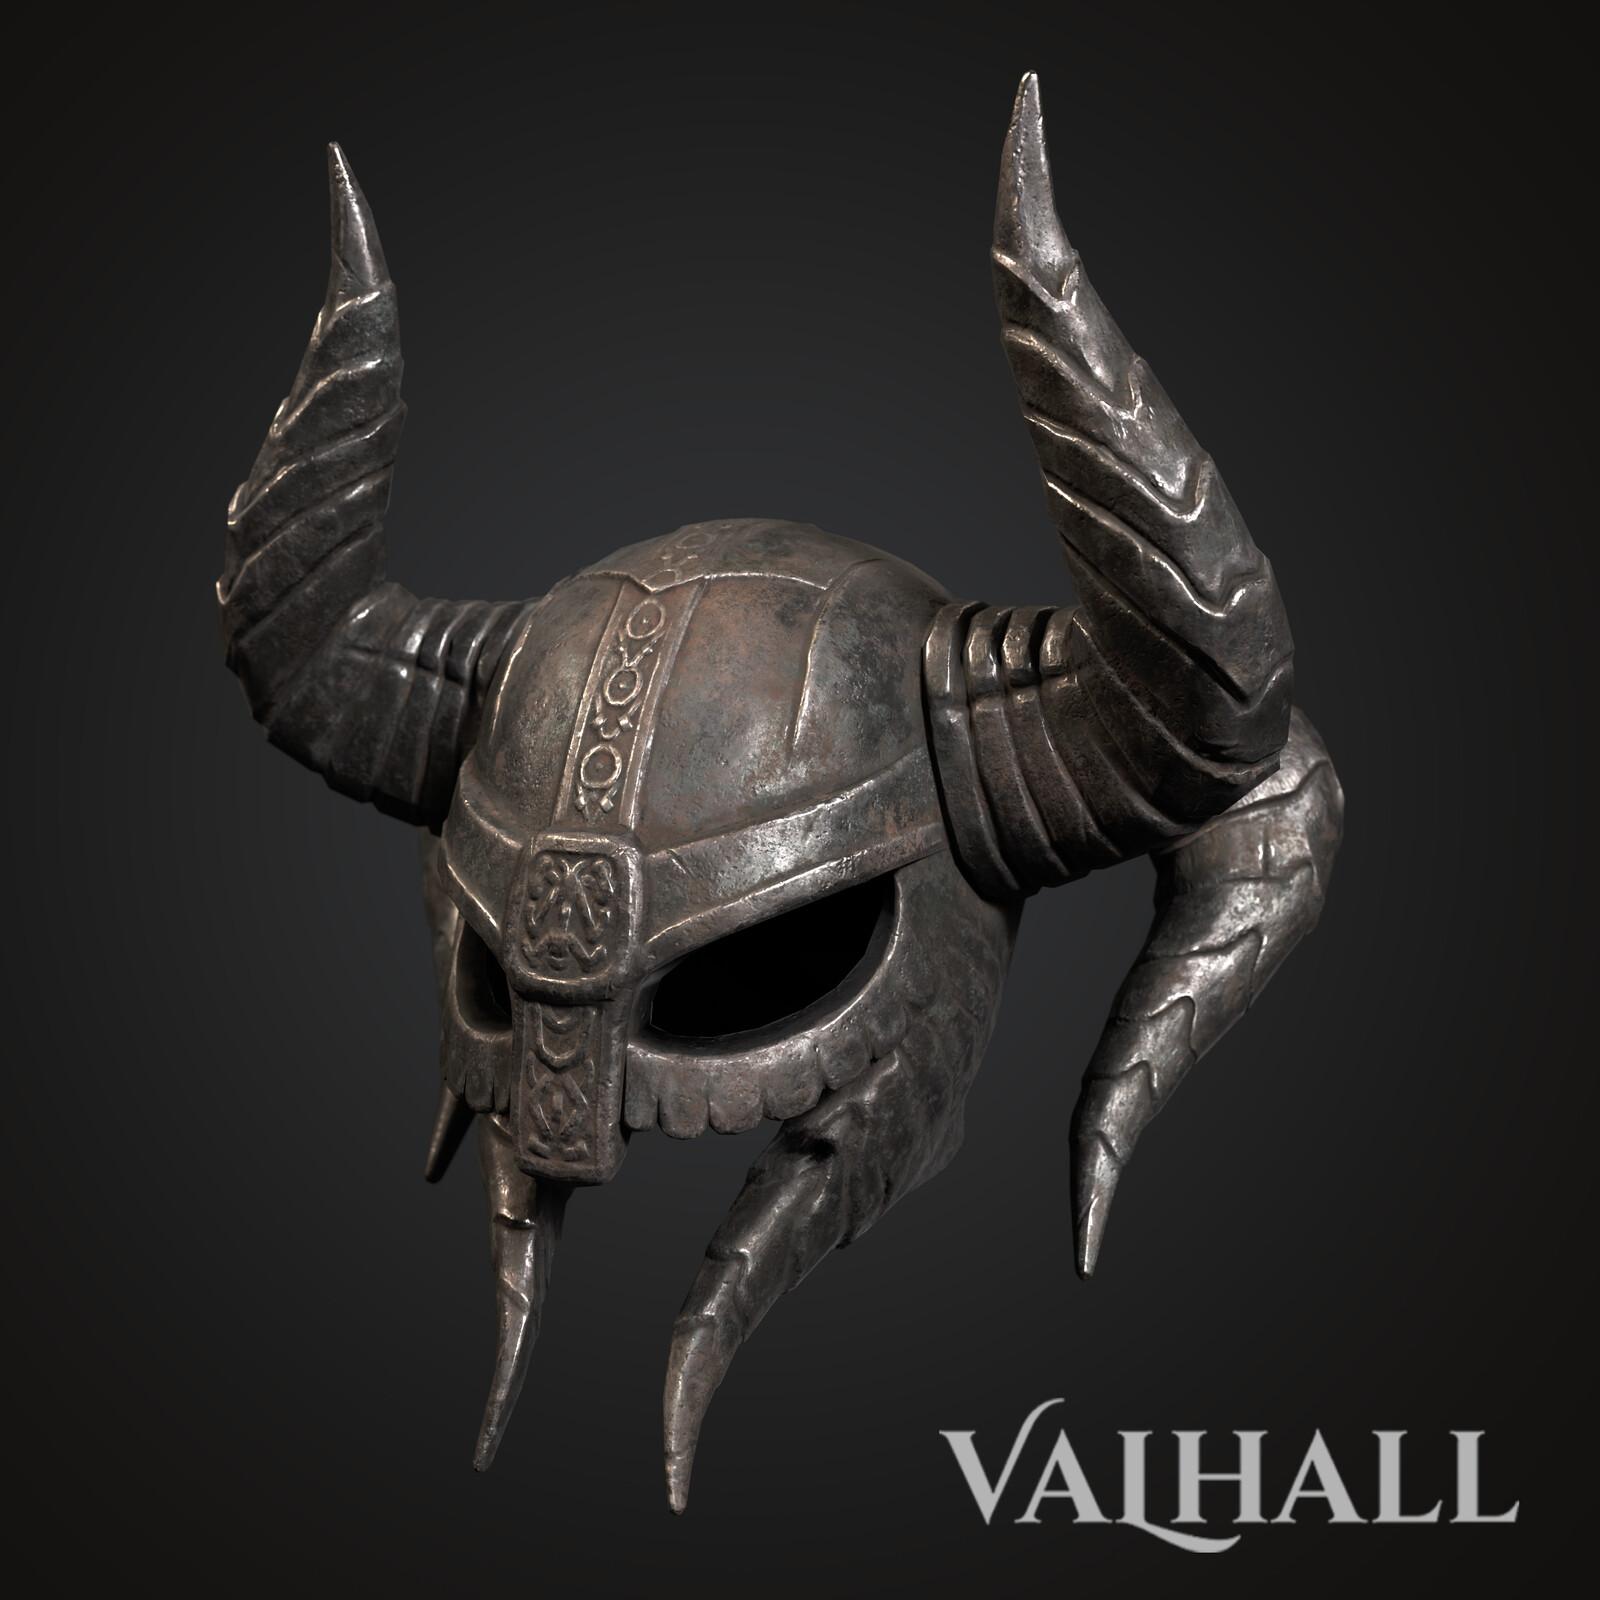 Odin's Helmet